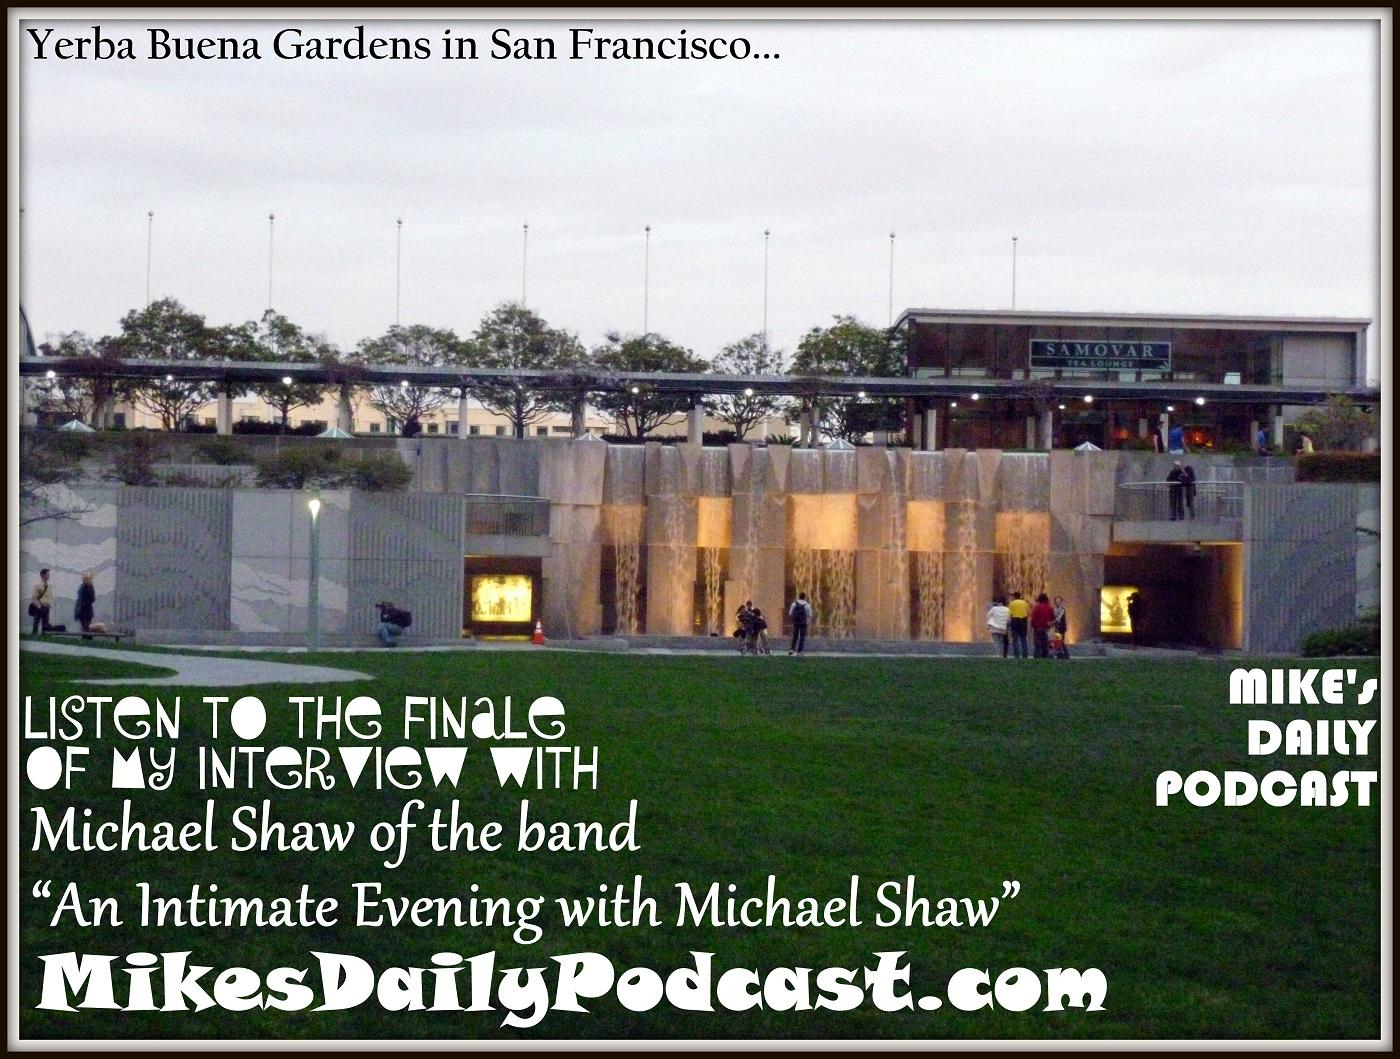 MIKEs DAILY PODCAST 8-13-15 Yerba Buena Gardens Michael Shaw